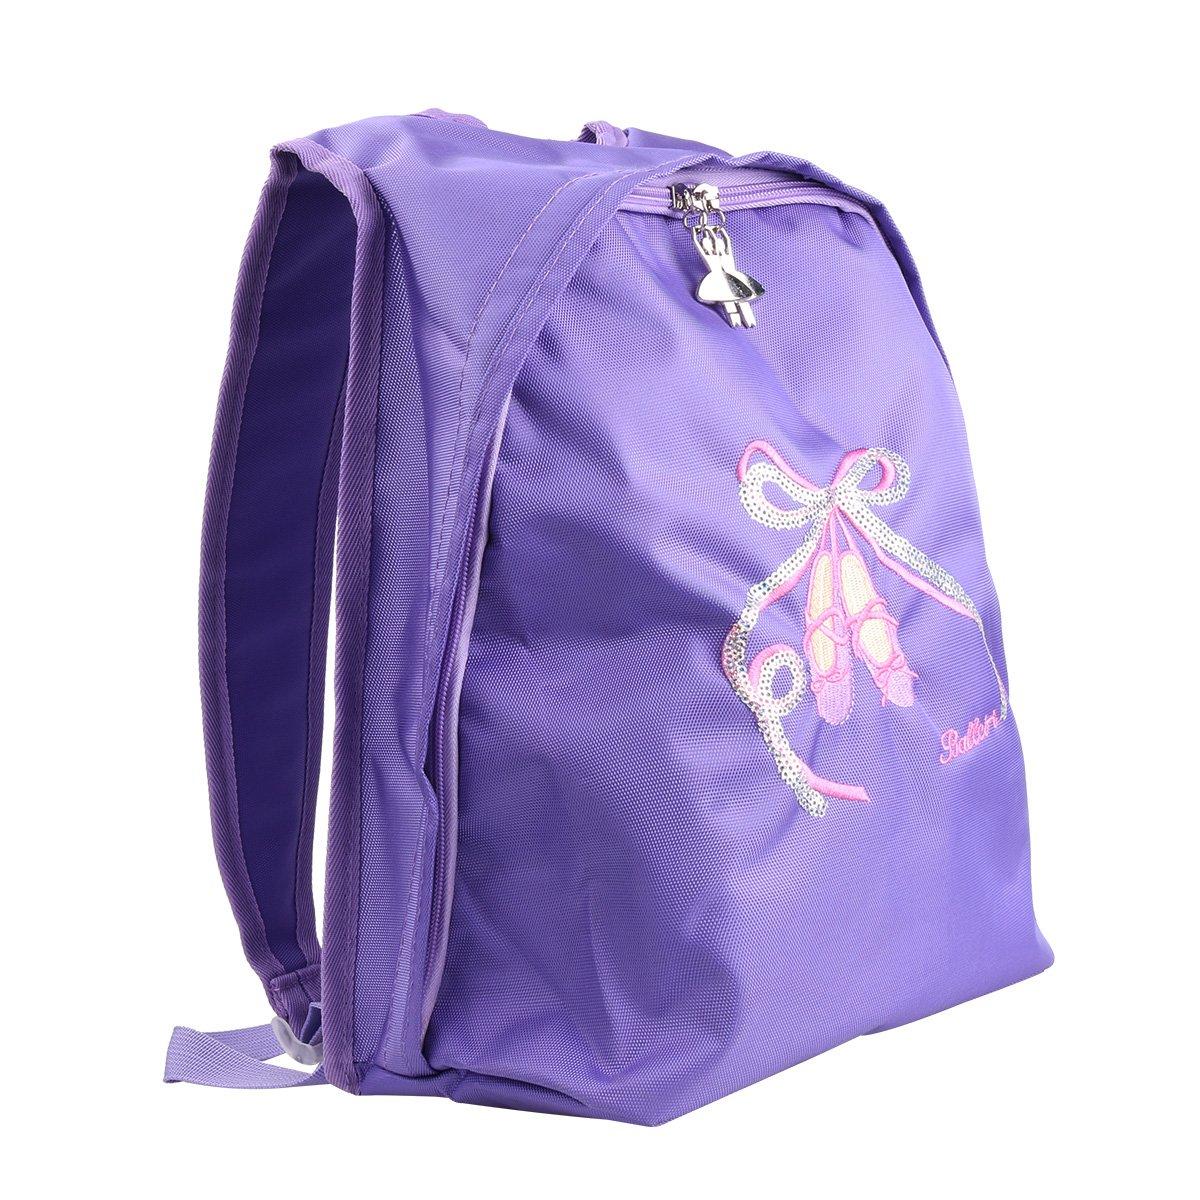 iEFiEL Girls Big Capacity Ballet Dance Tote Bag Travel Carry Shoulder Bag Purple One Size